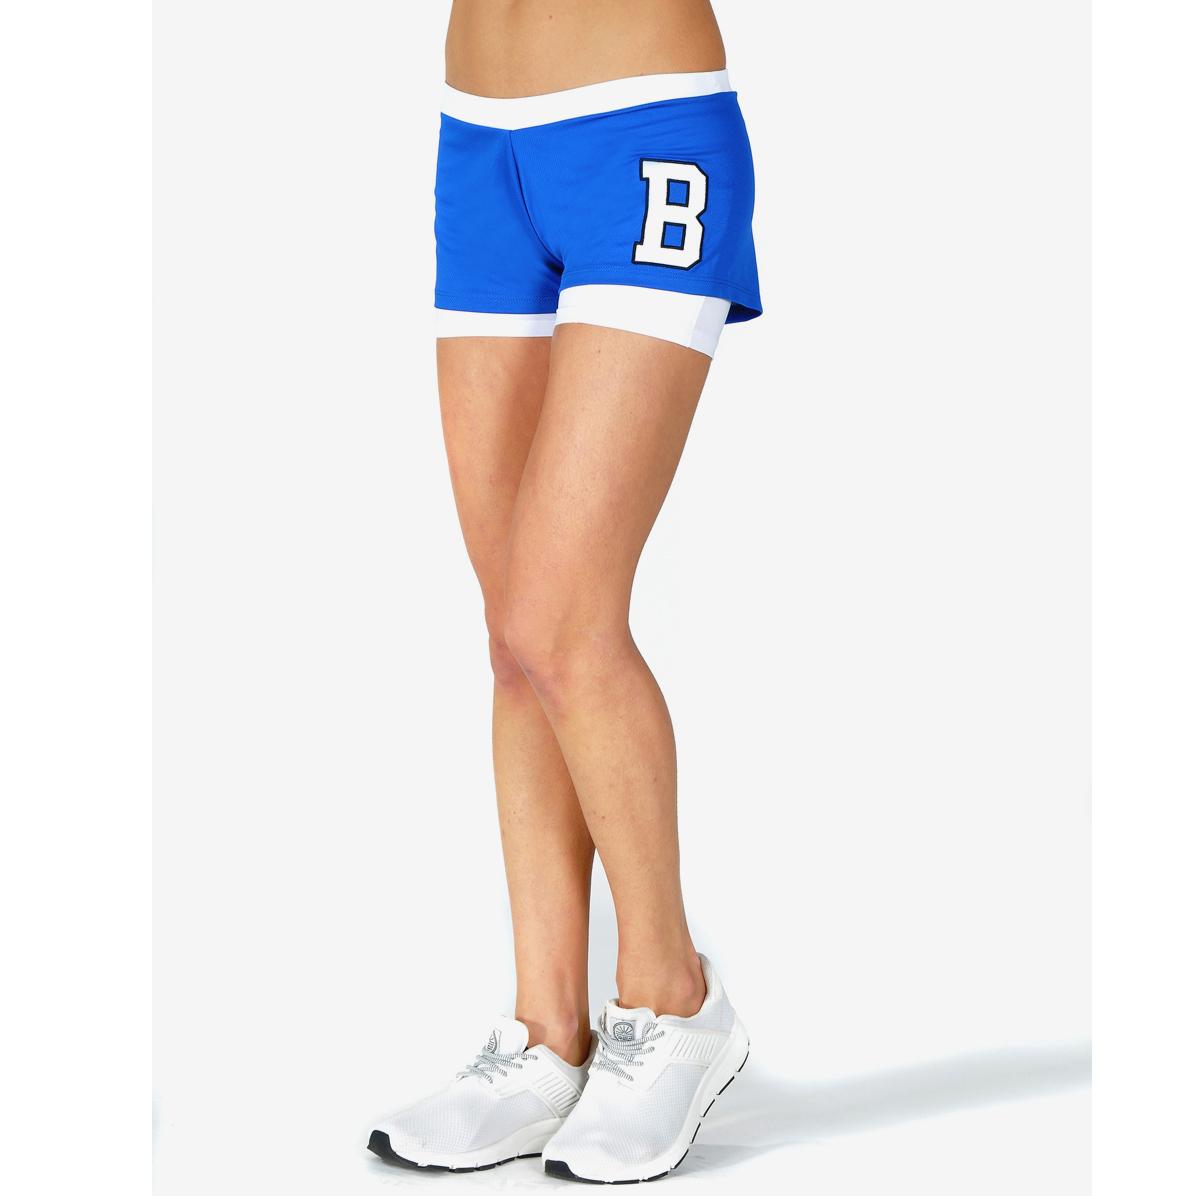 BODYTALK - Γυναικείο σορτς BODYTALK μπλε γυναικεία ρούχα σορτς βερμούδες αθλητικά